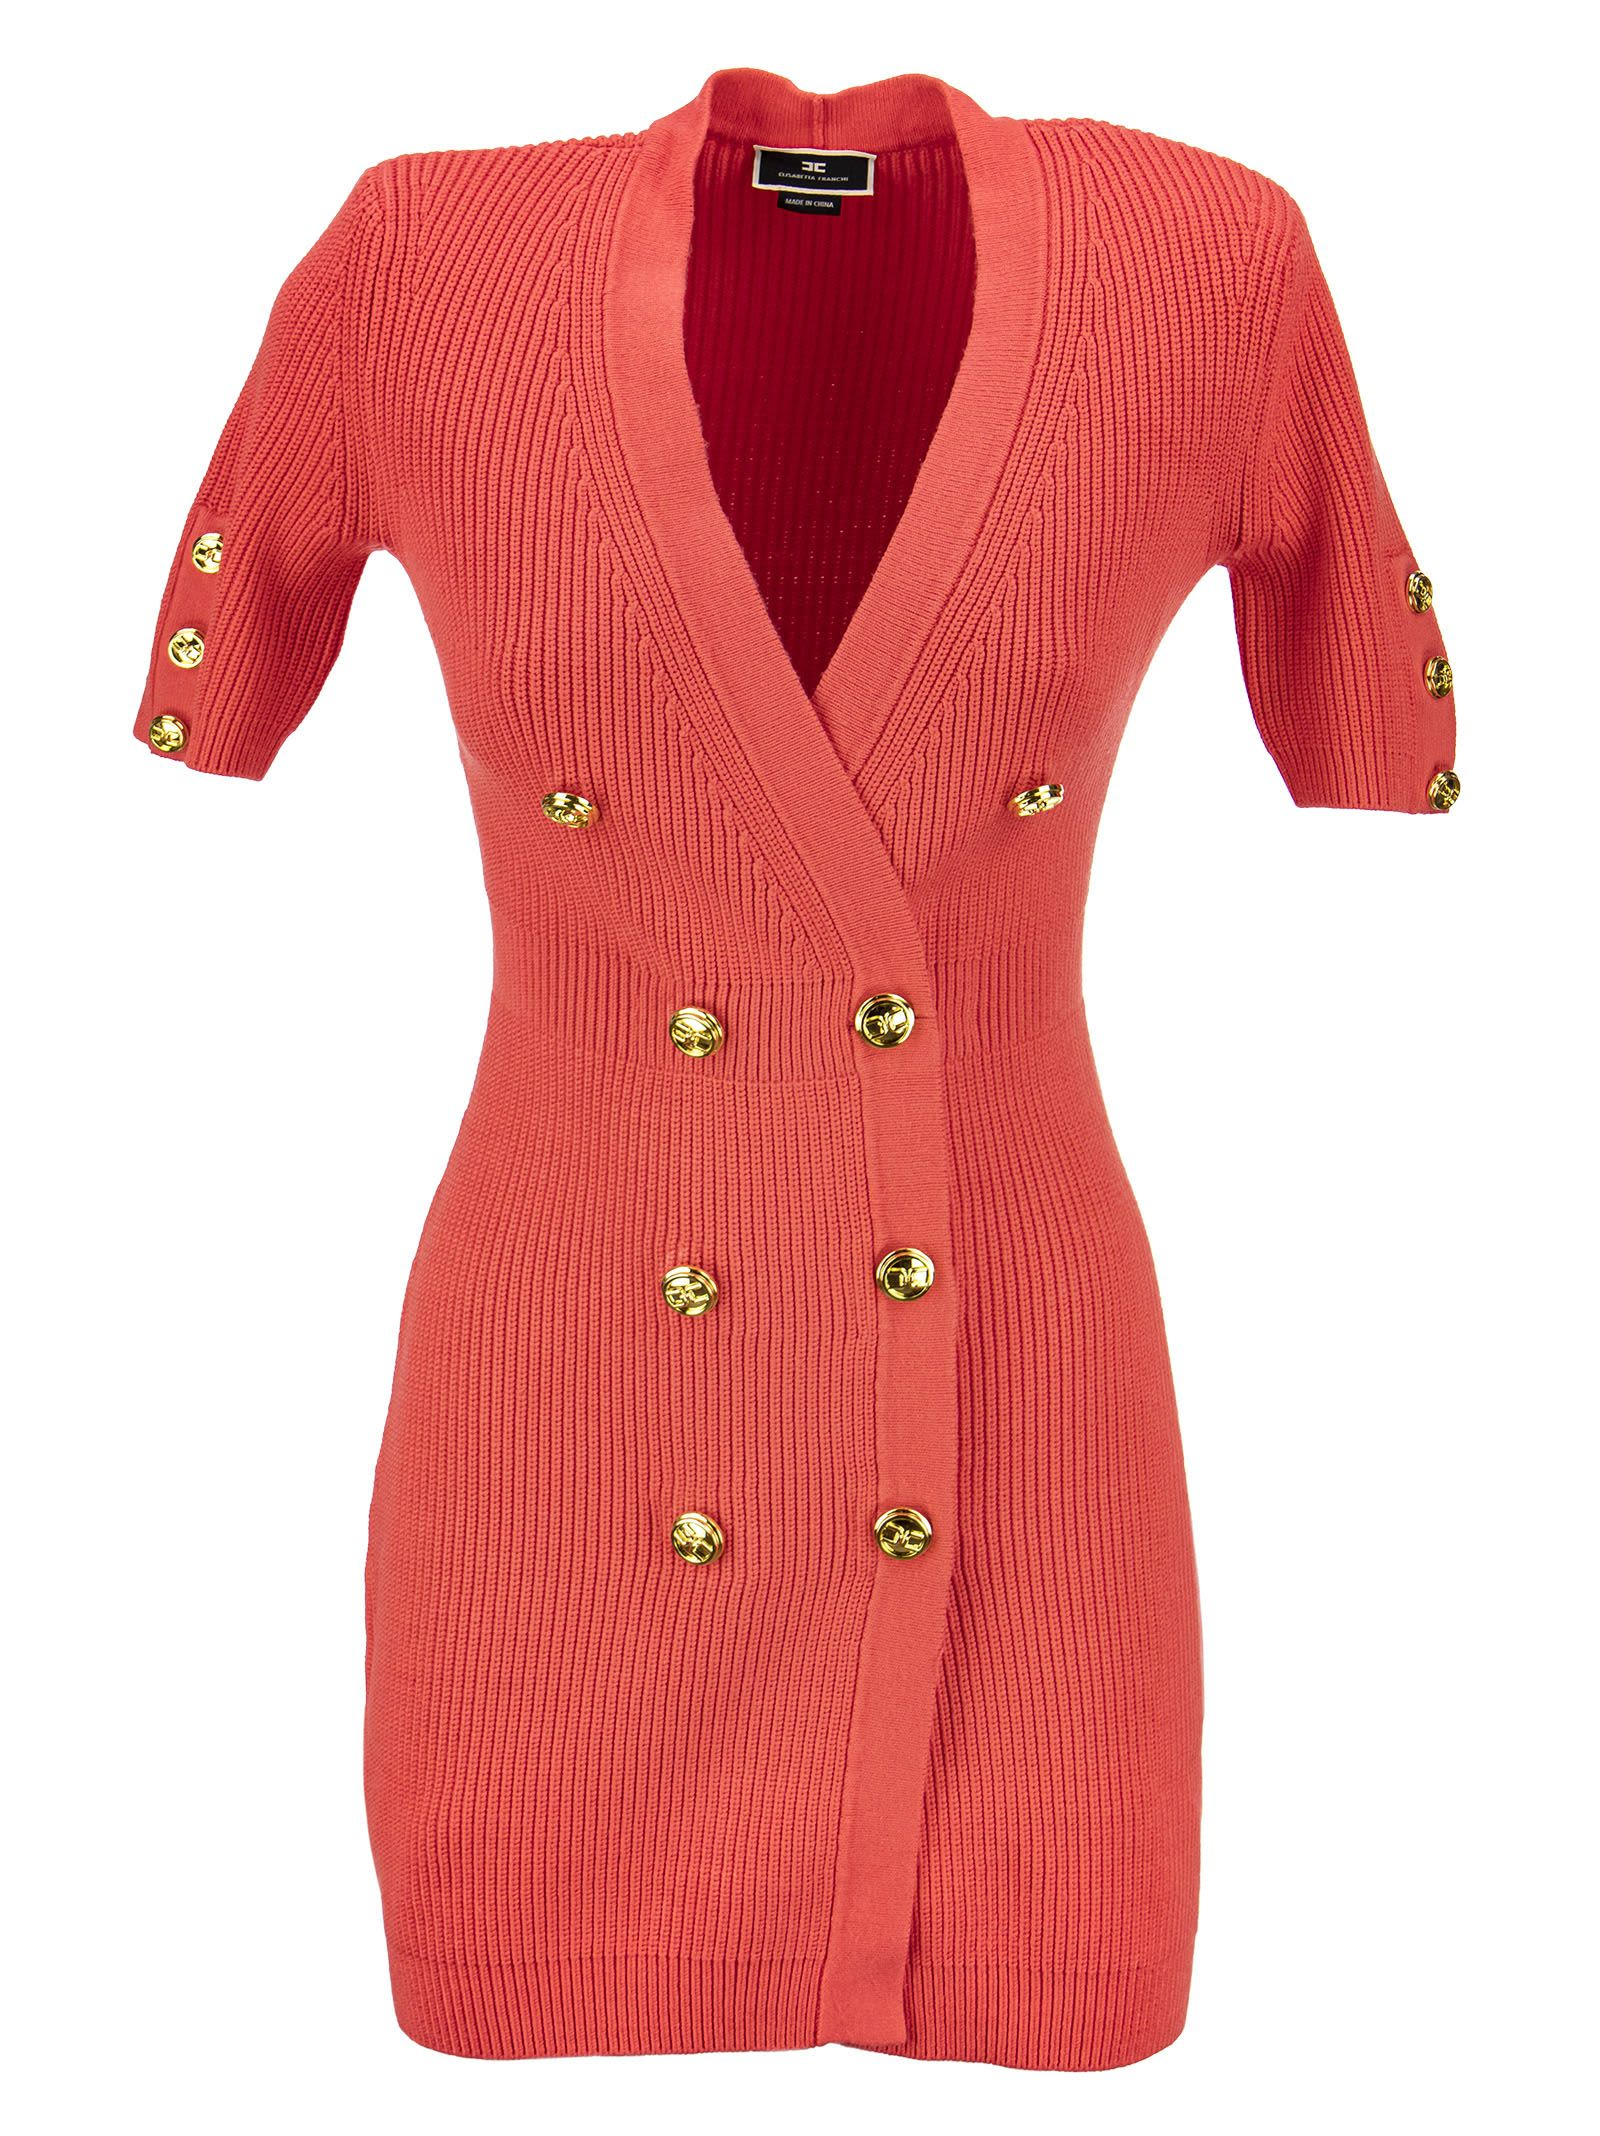 Buy Elisabetta Franchi Mini Coat Dress In Knit Fabric online, shop Elisabetta Franchi with free shipping